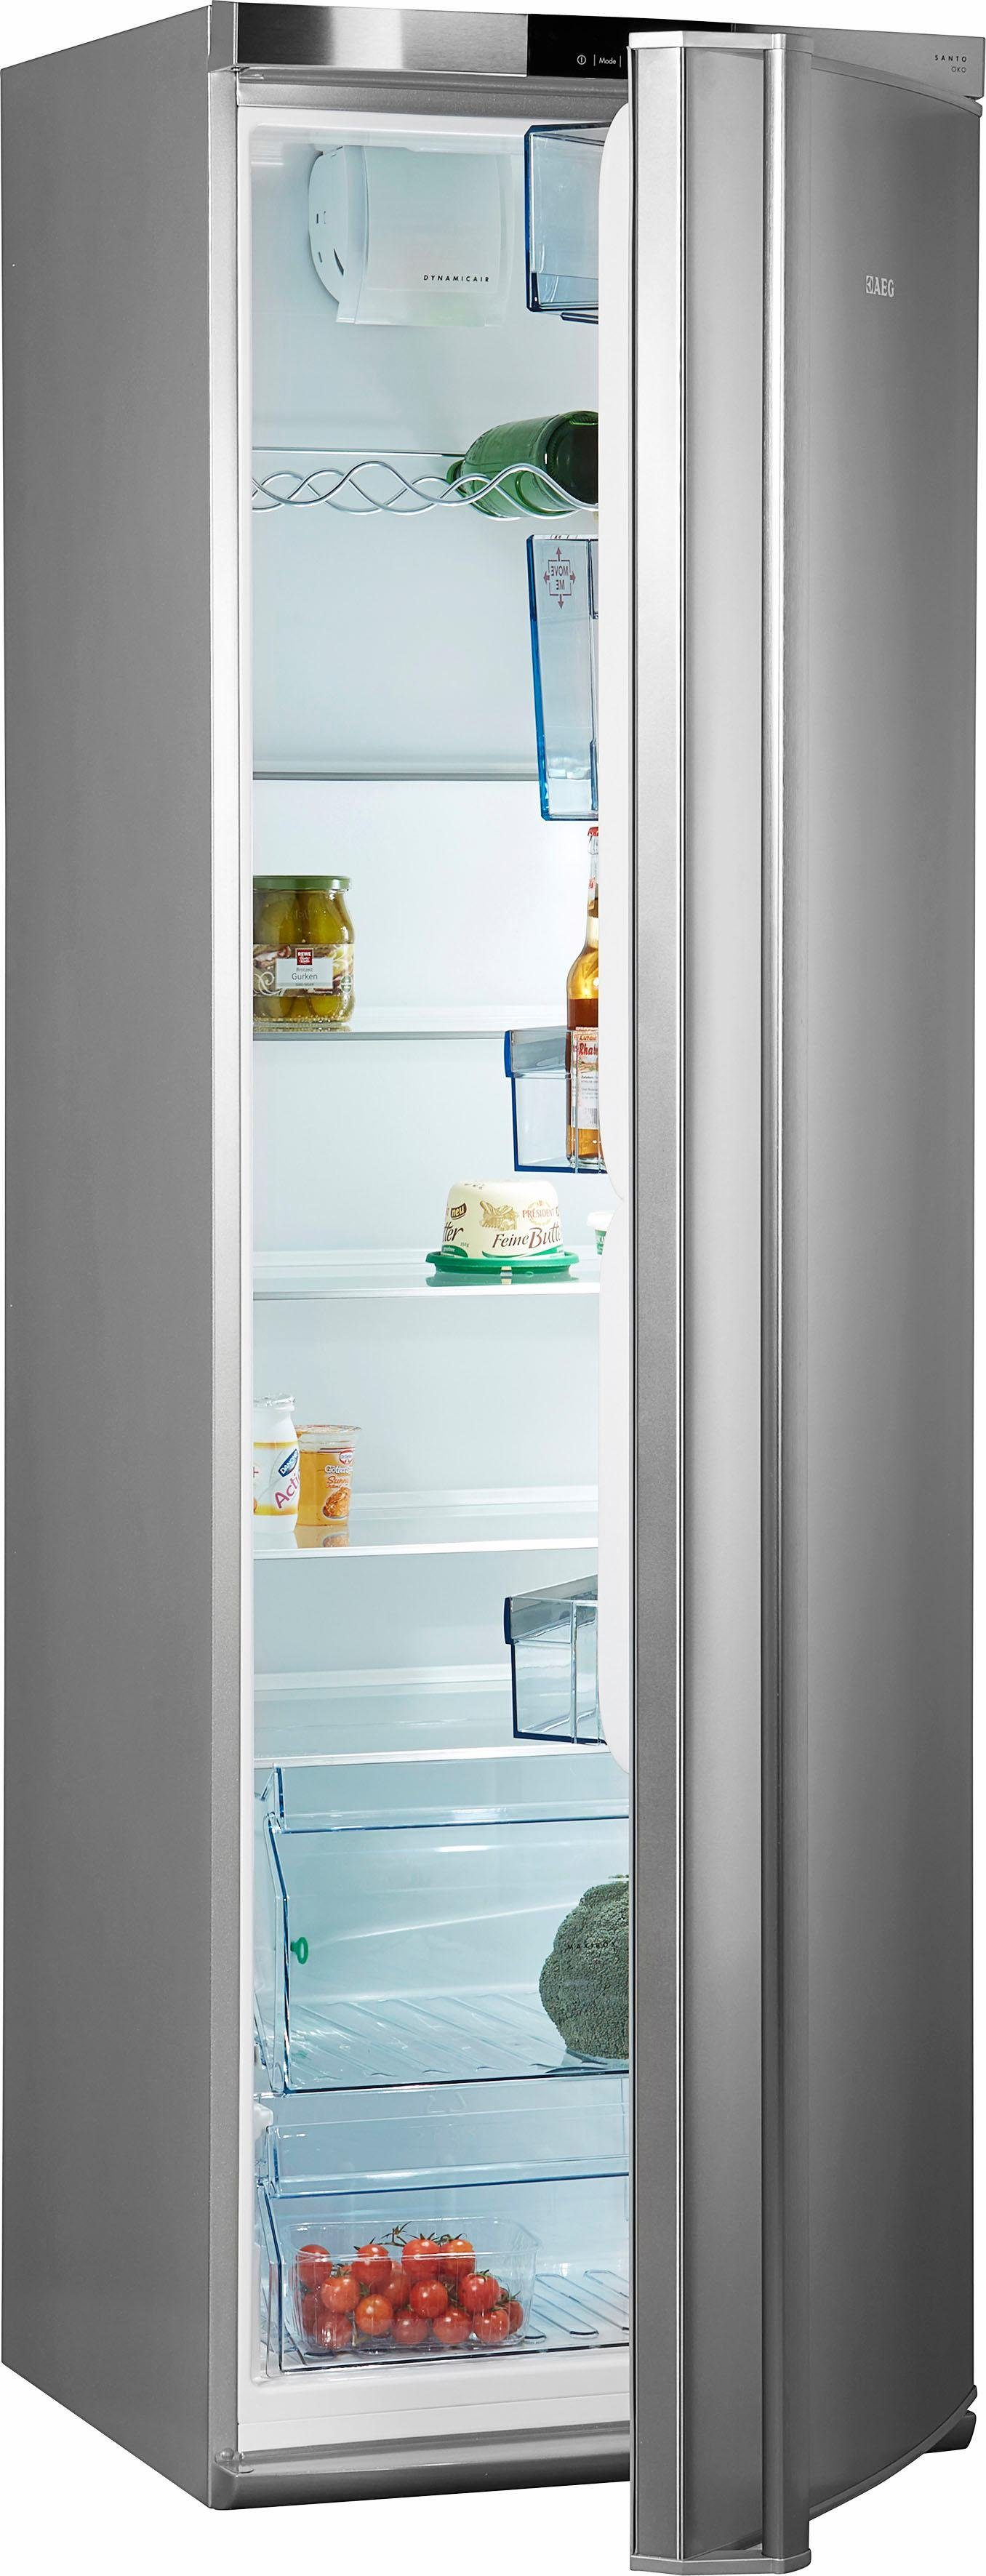 AEG Kühlschrank SANTO S74010KDXF, A++, 185 cm hoch